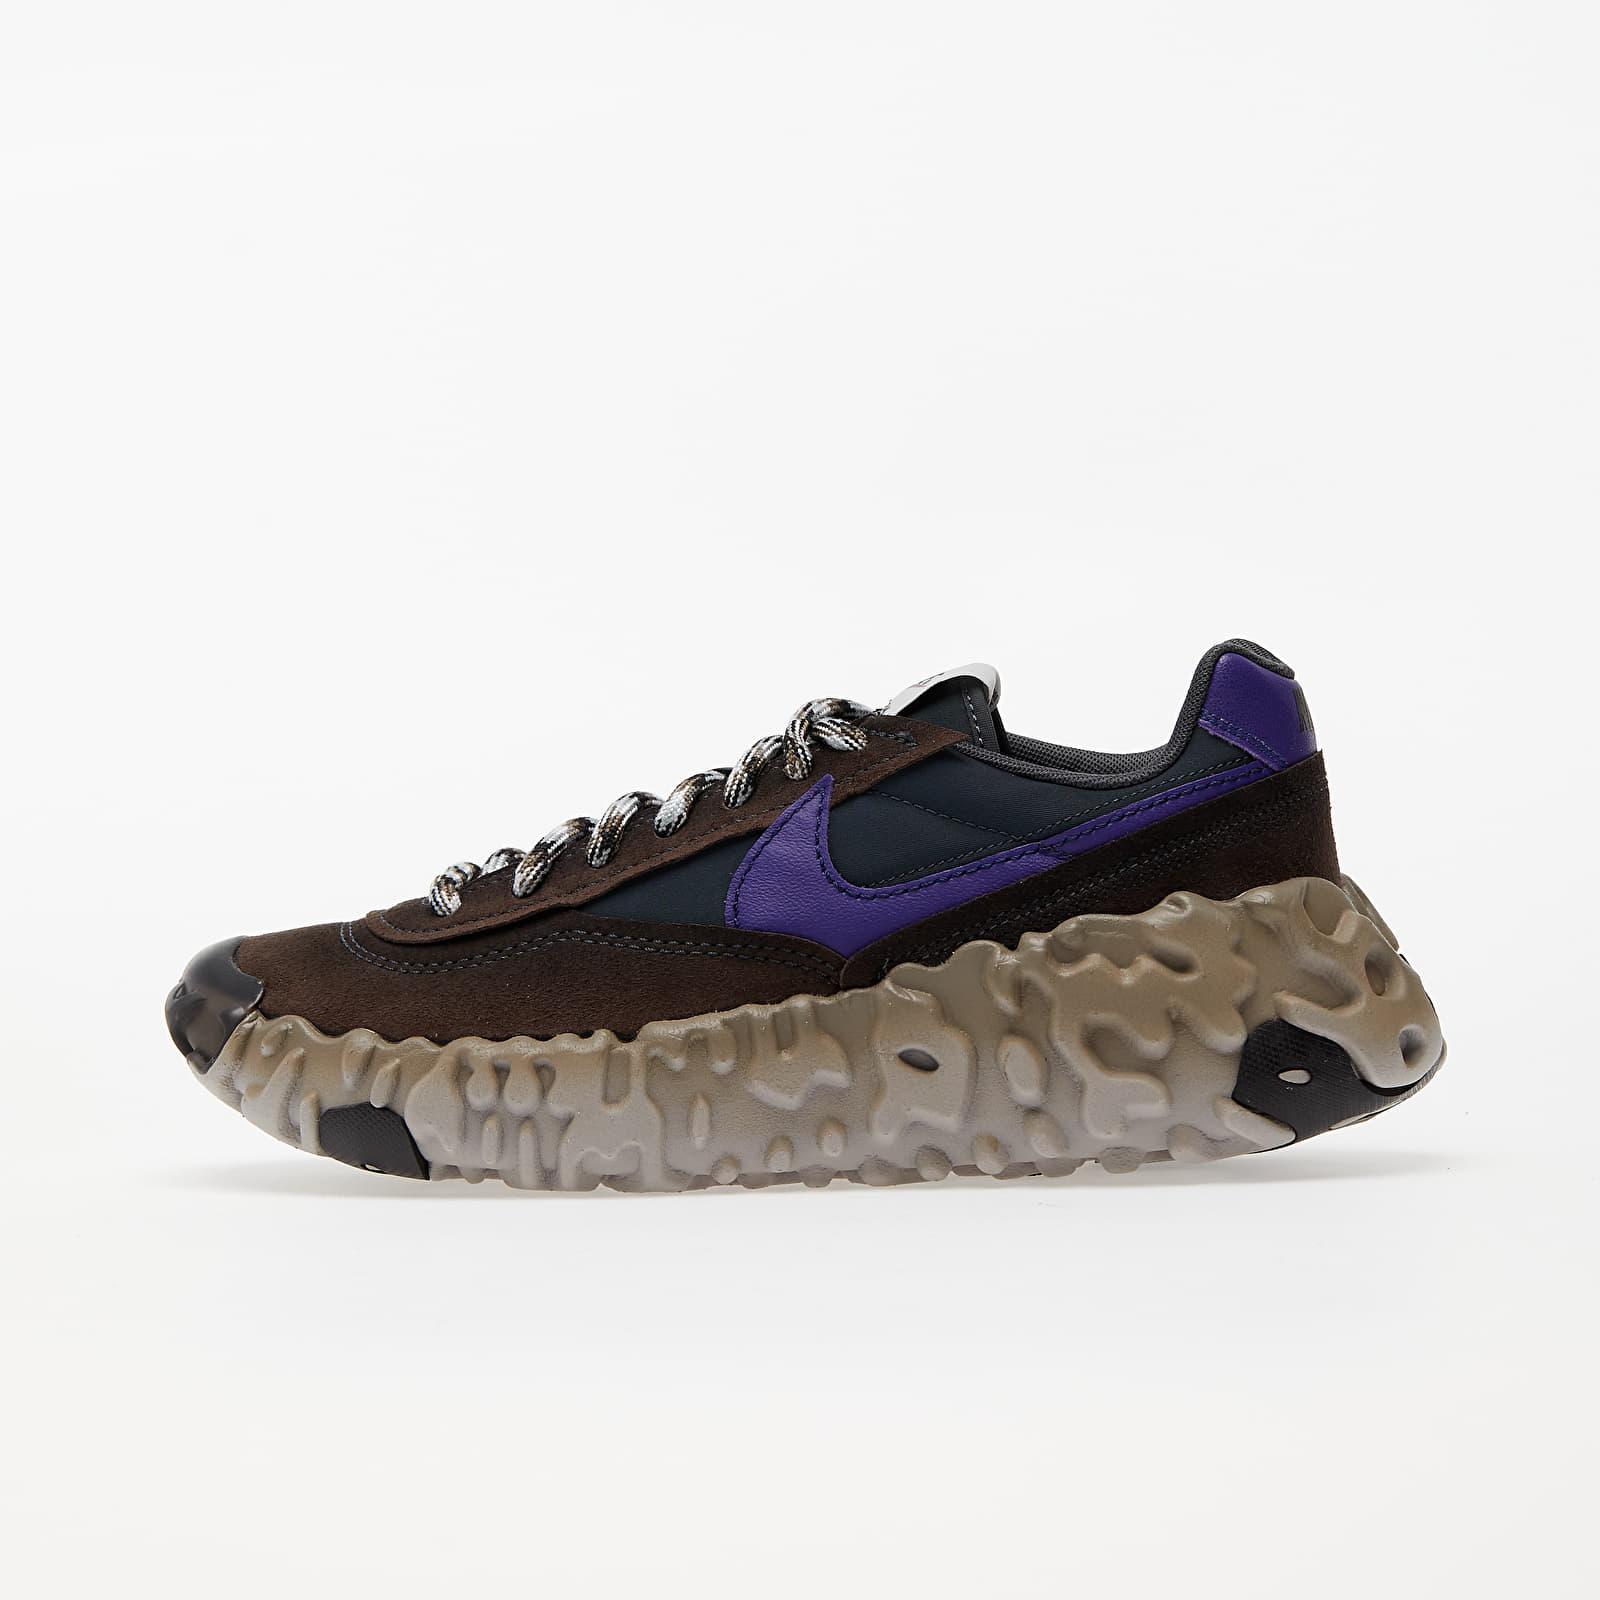 Nike W Overbreak SP Baroque Brown/ New Orchid-Black DA9784-200